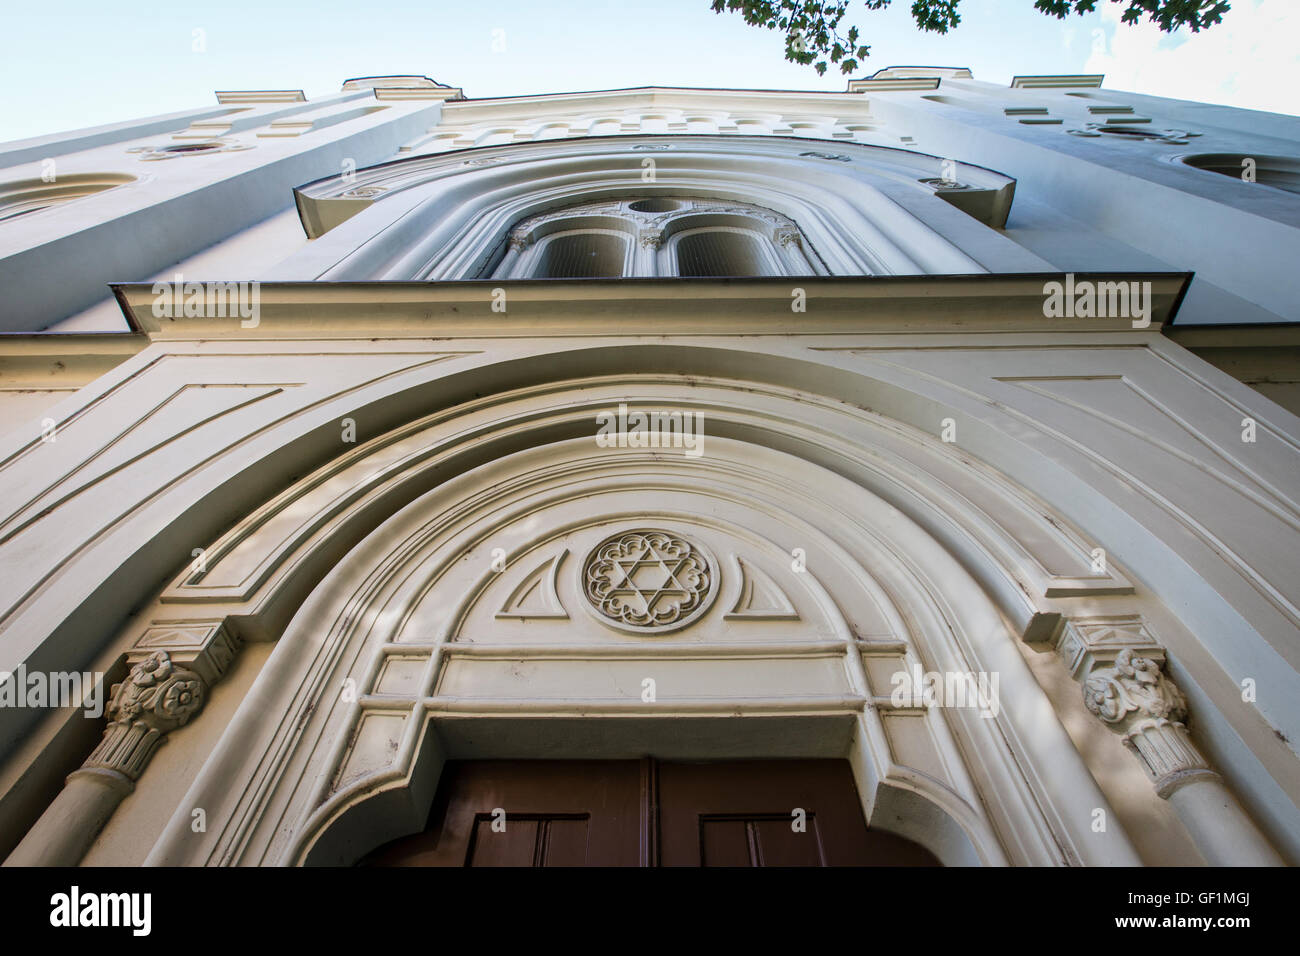 synagogue, Krnov, judaism, religion, Jews Stock Photo